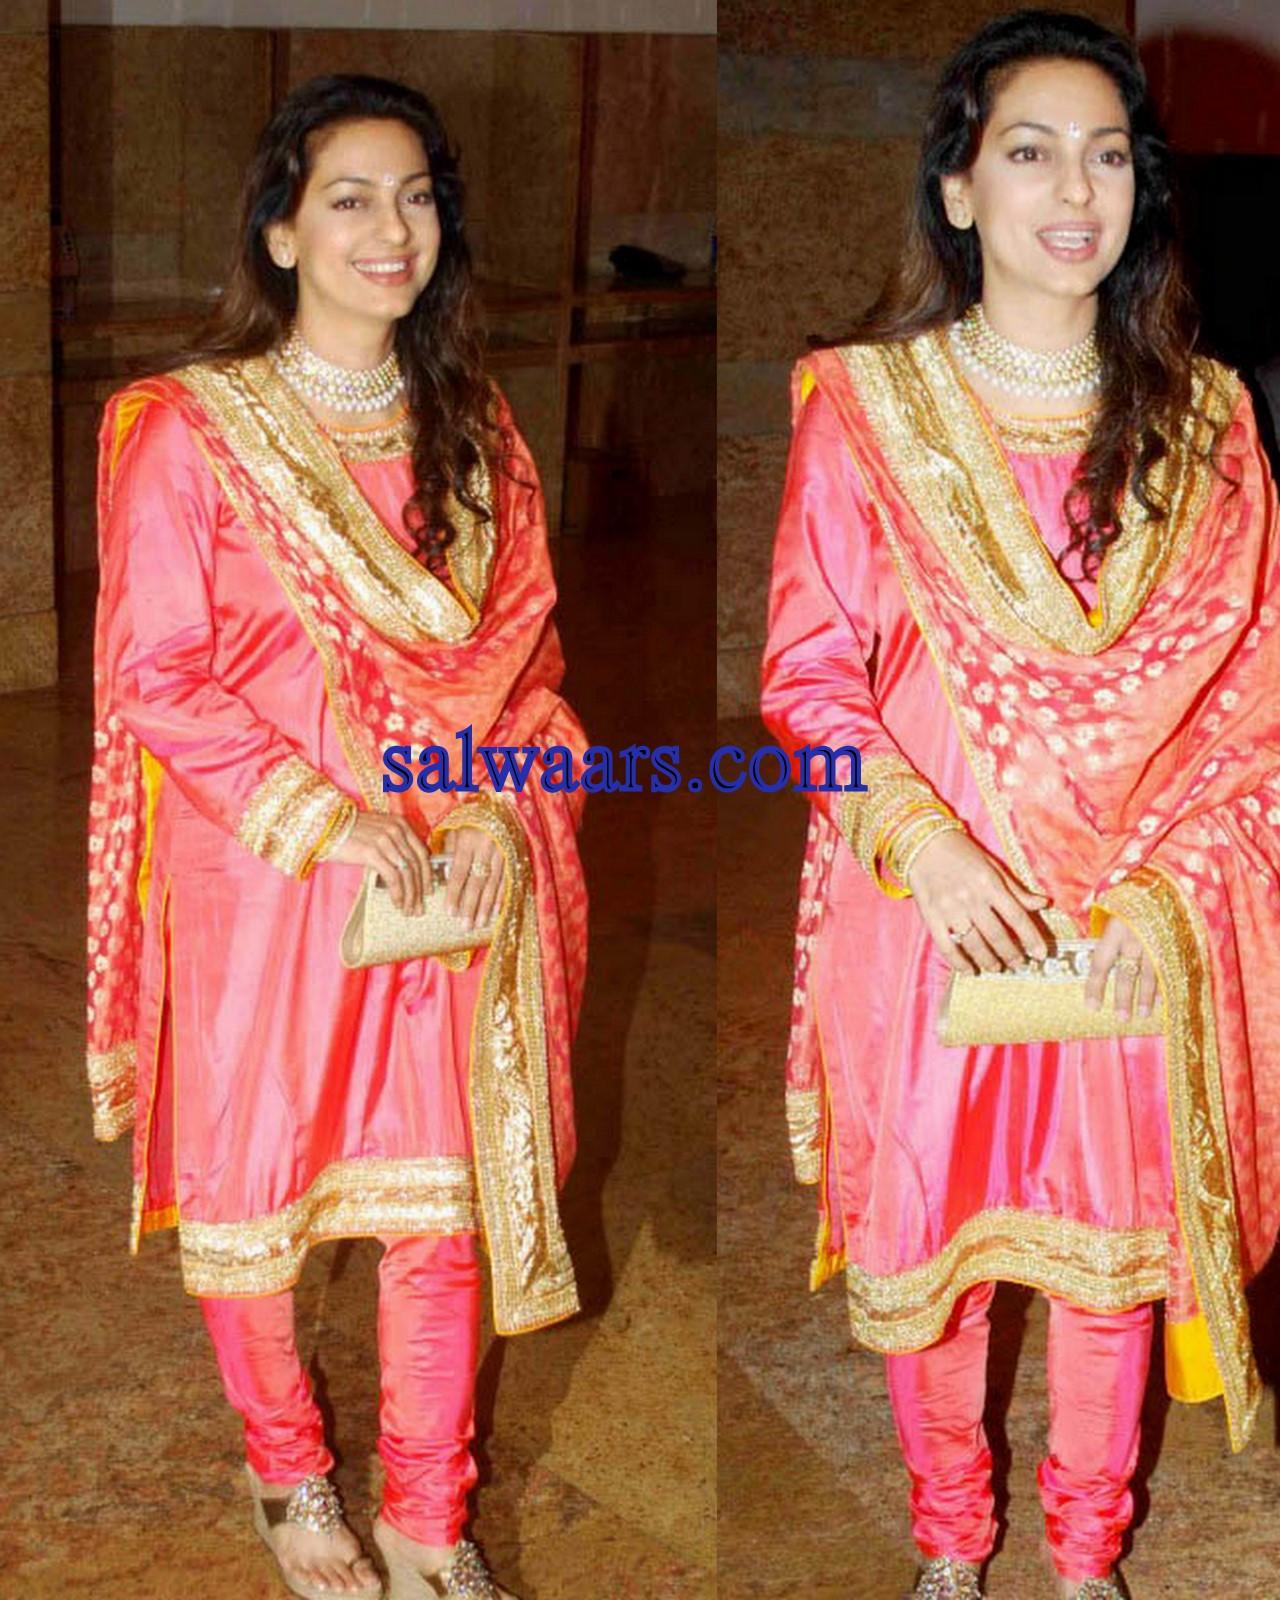 Bollywood Celebrities Salwar Kameez At Shilpa Shetty